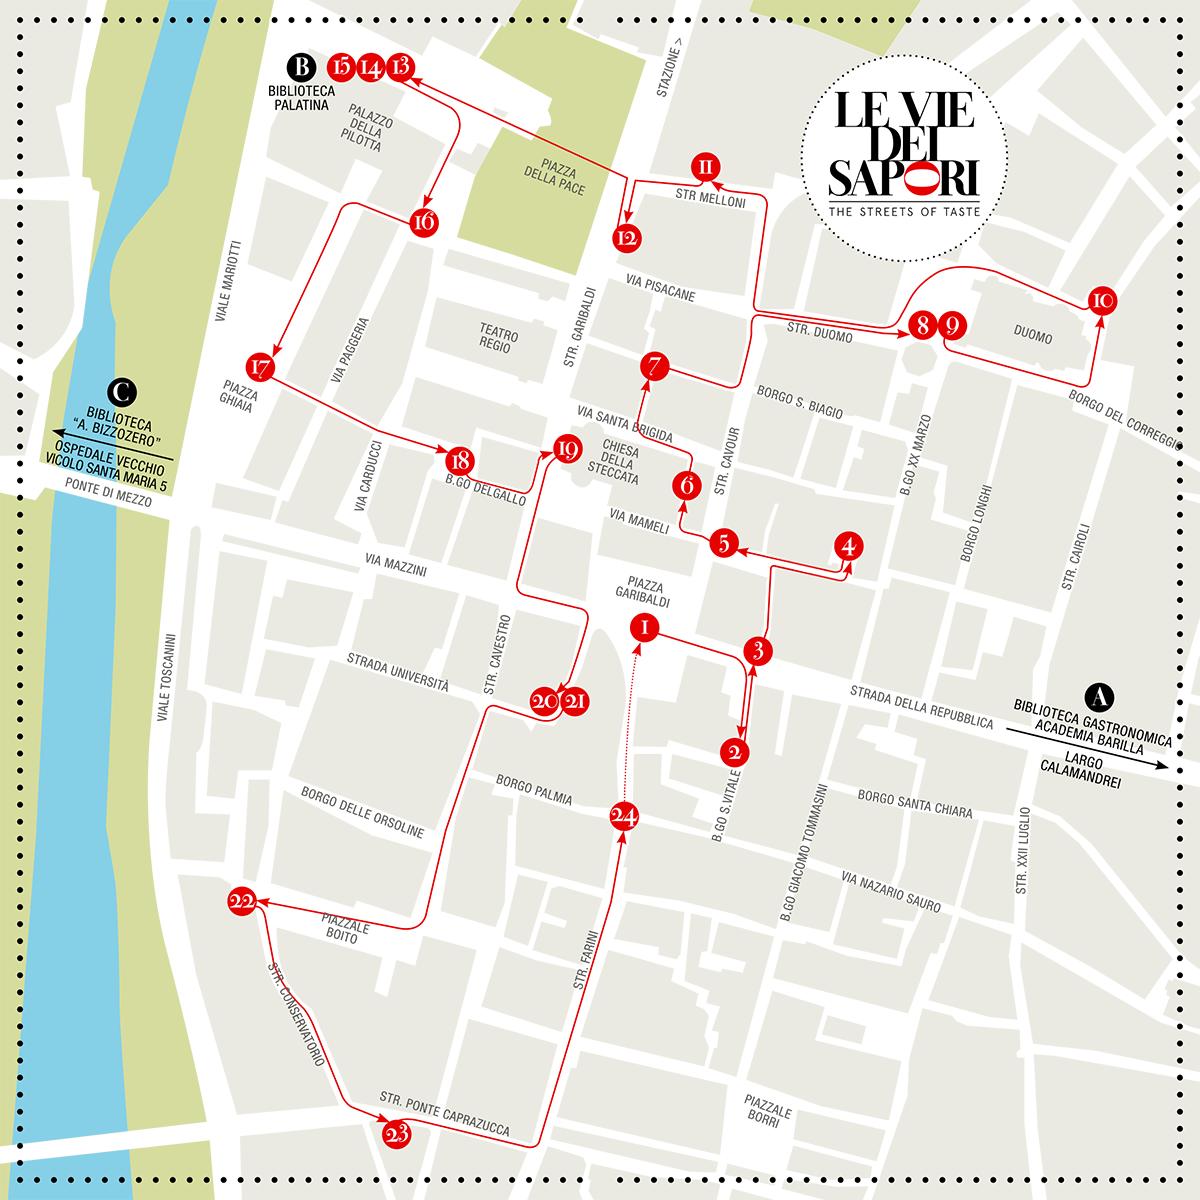 vds_map